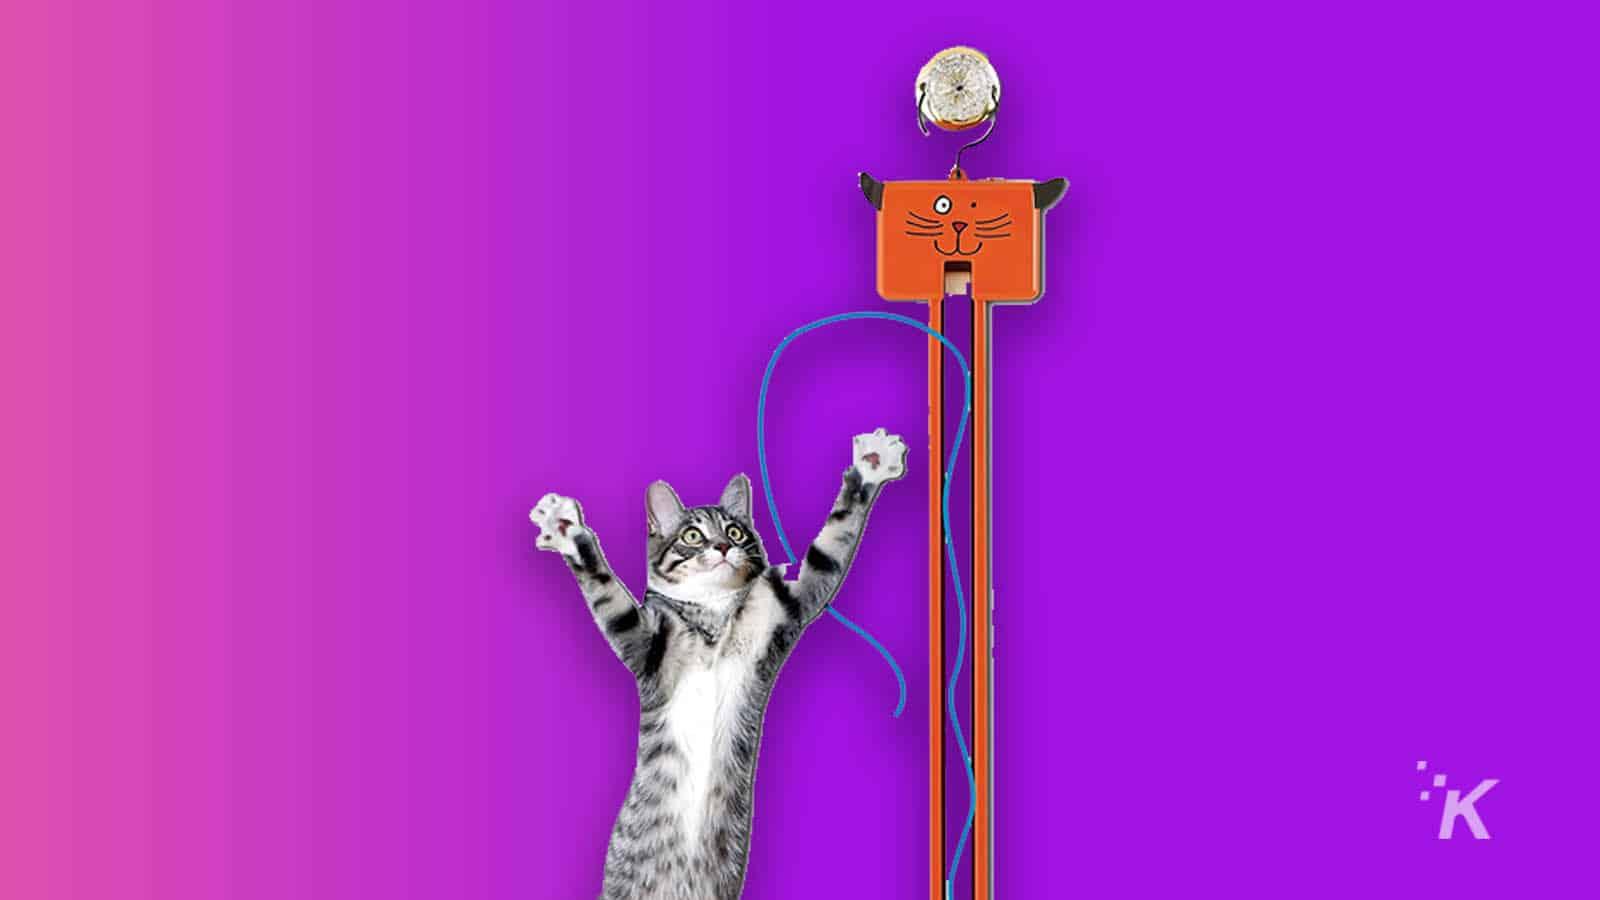 moody pet fling cat toy